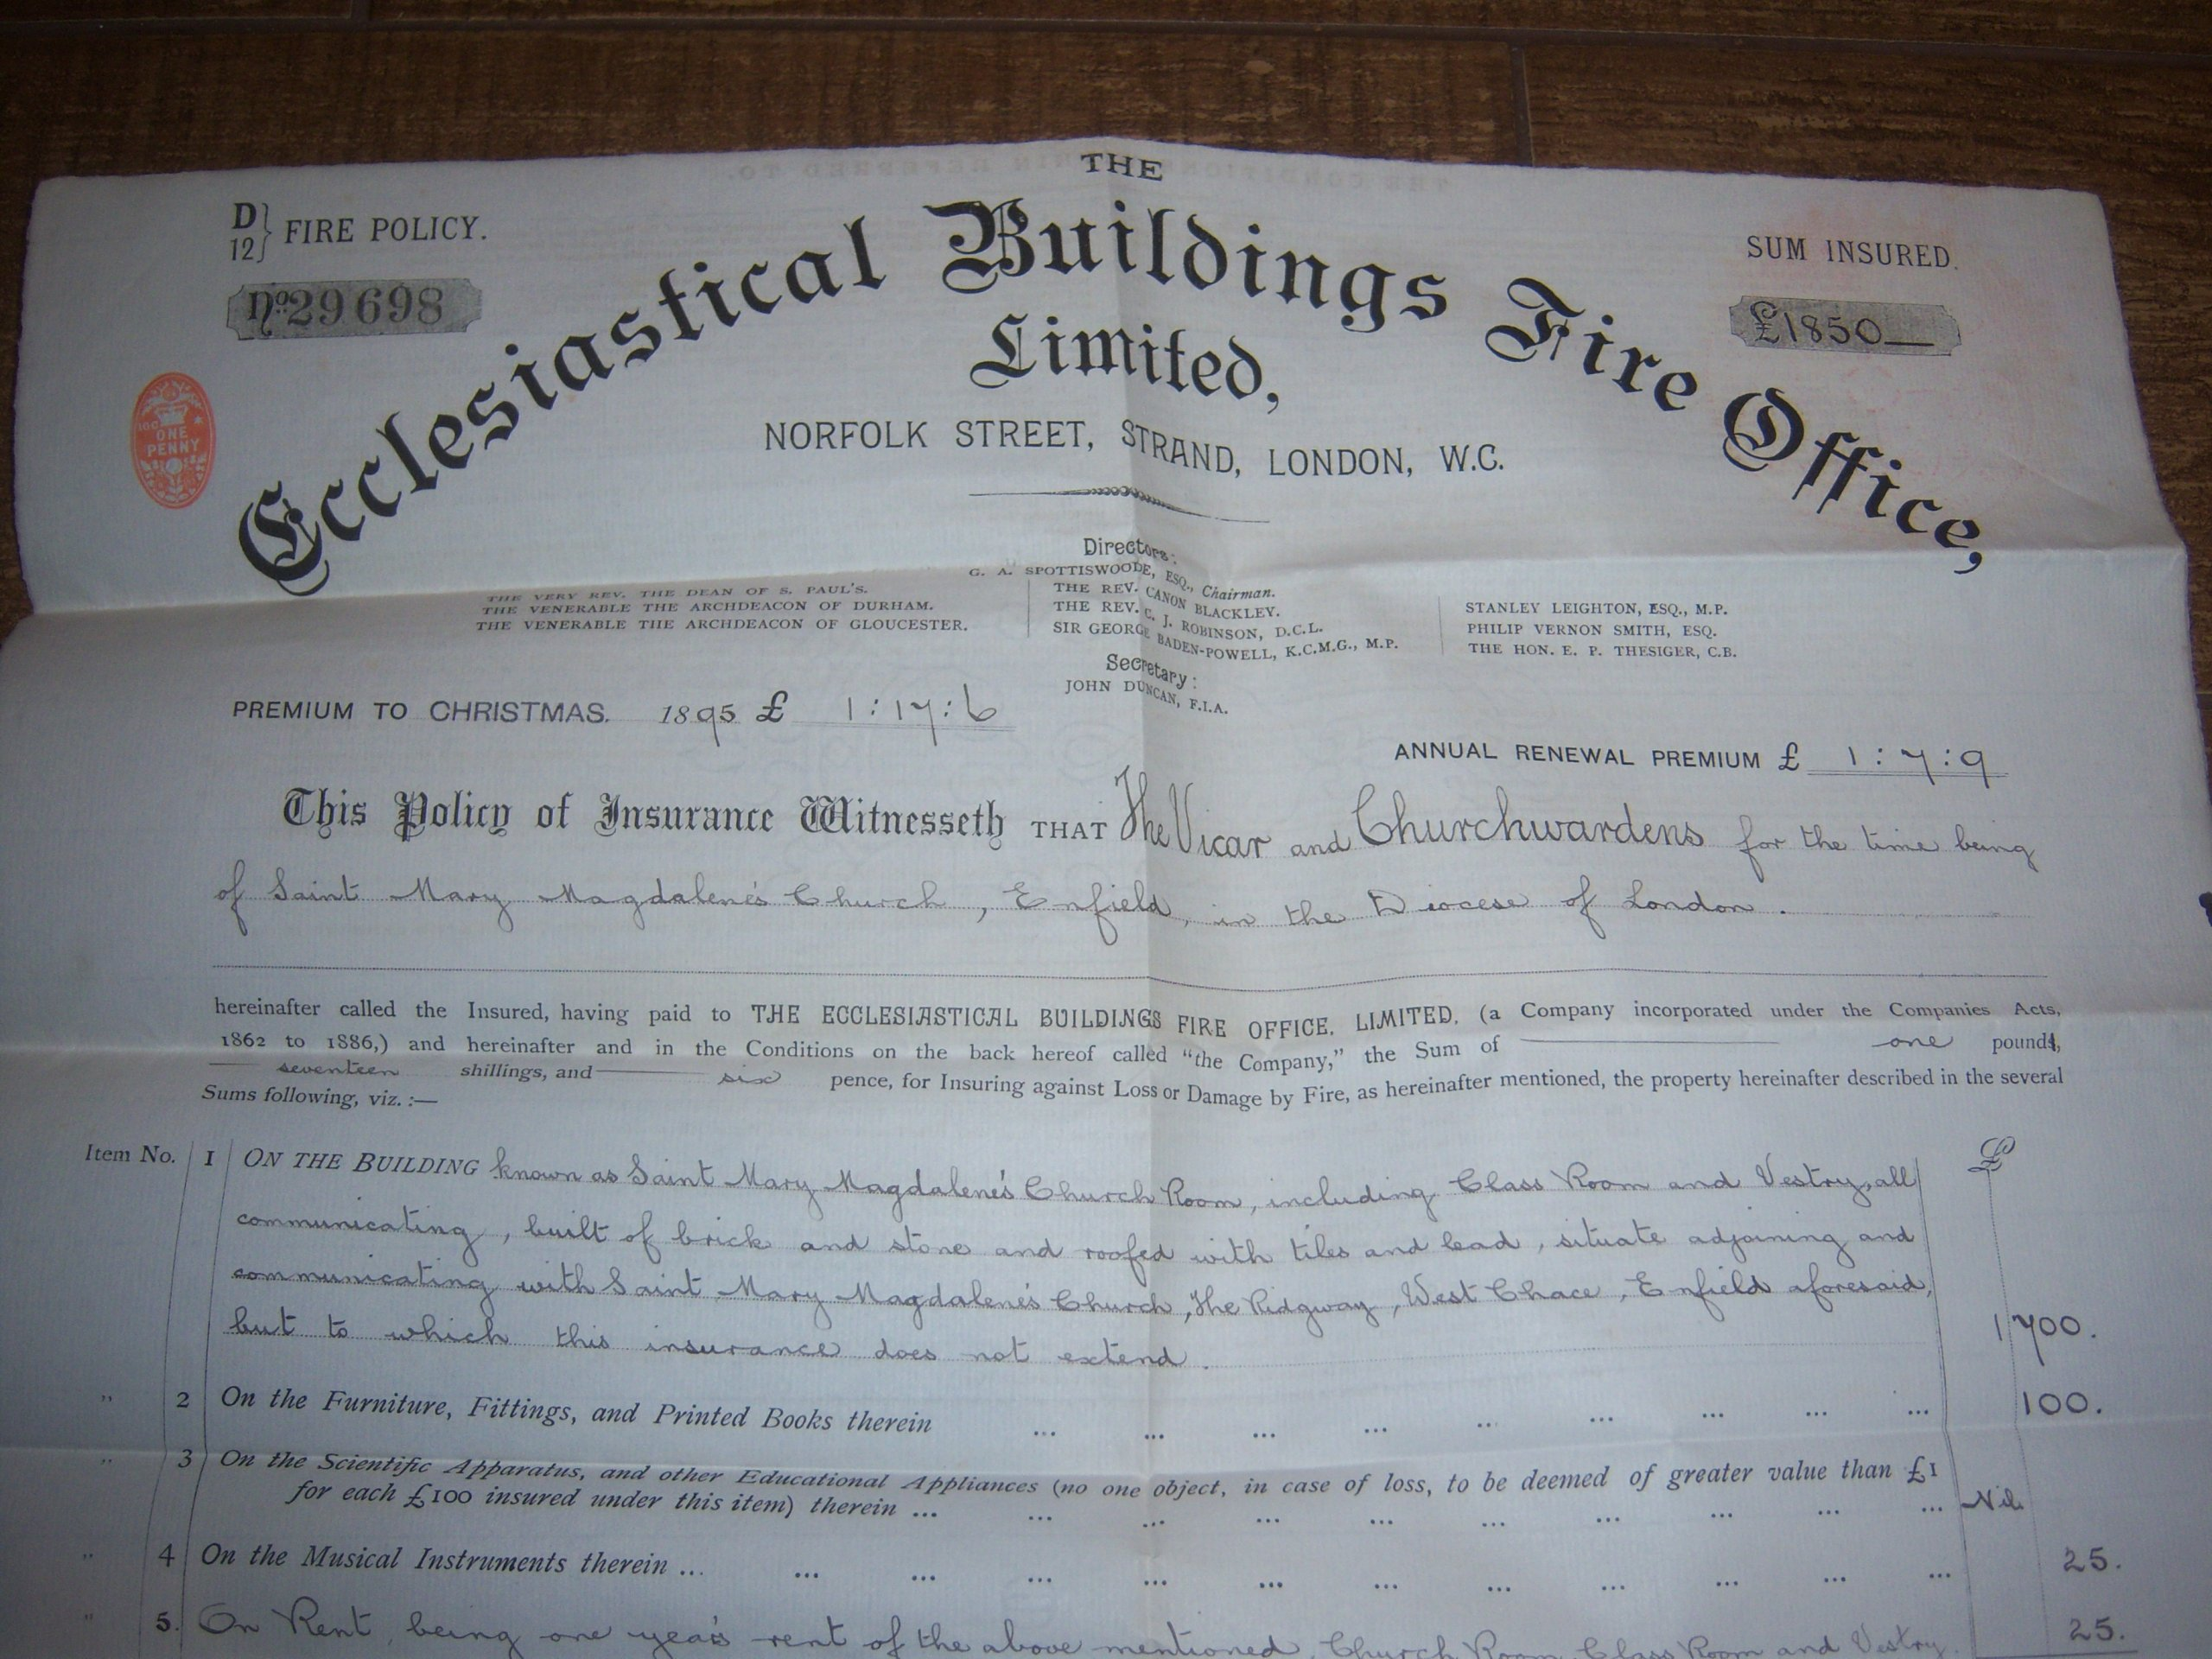 ANGLIA WIELKA POLISA ECCLESIASTICAL Z 1894 ROKU